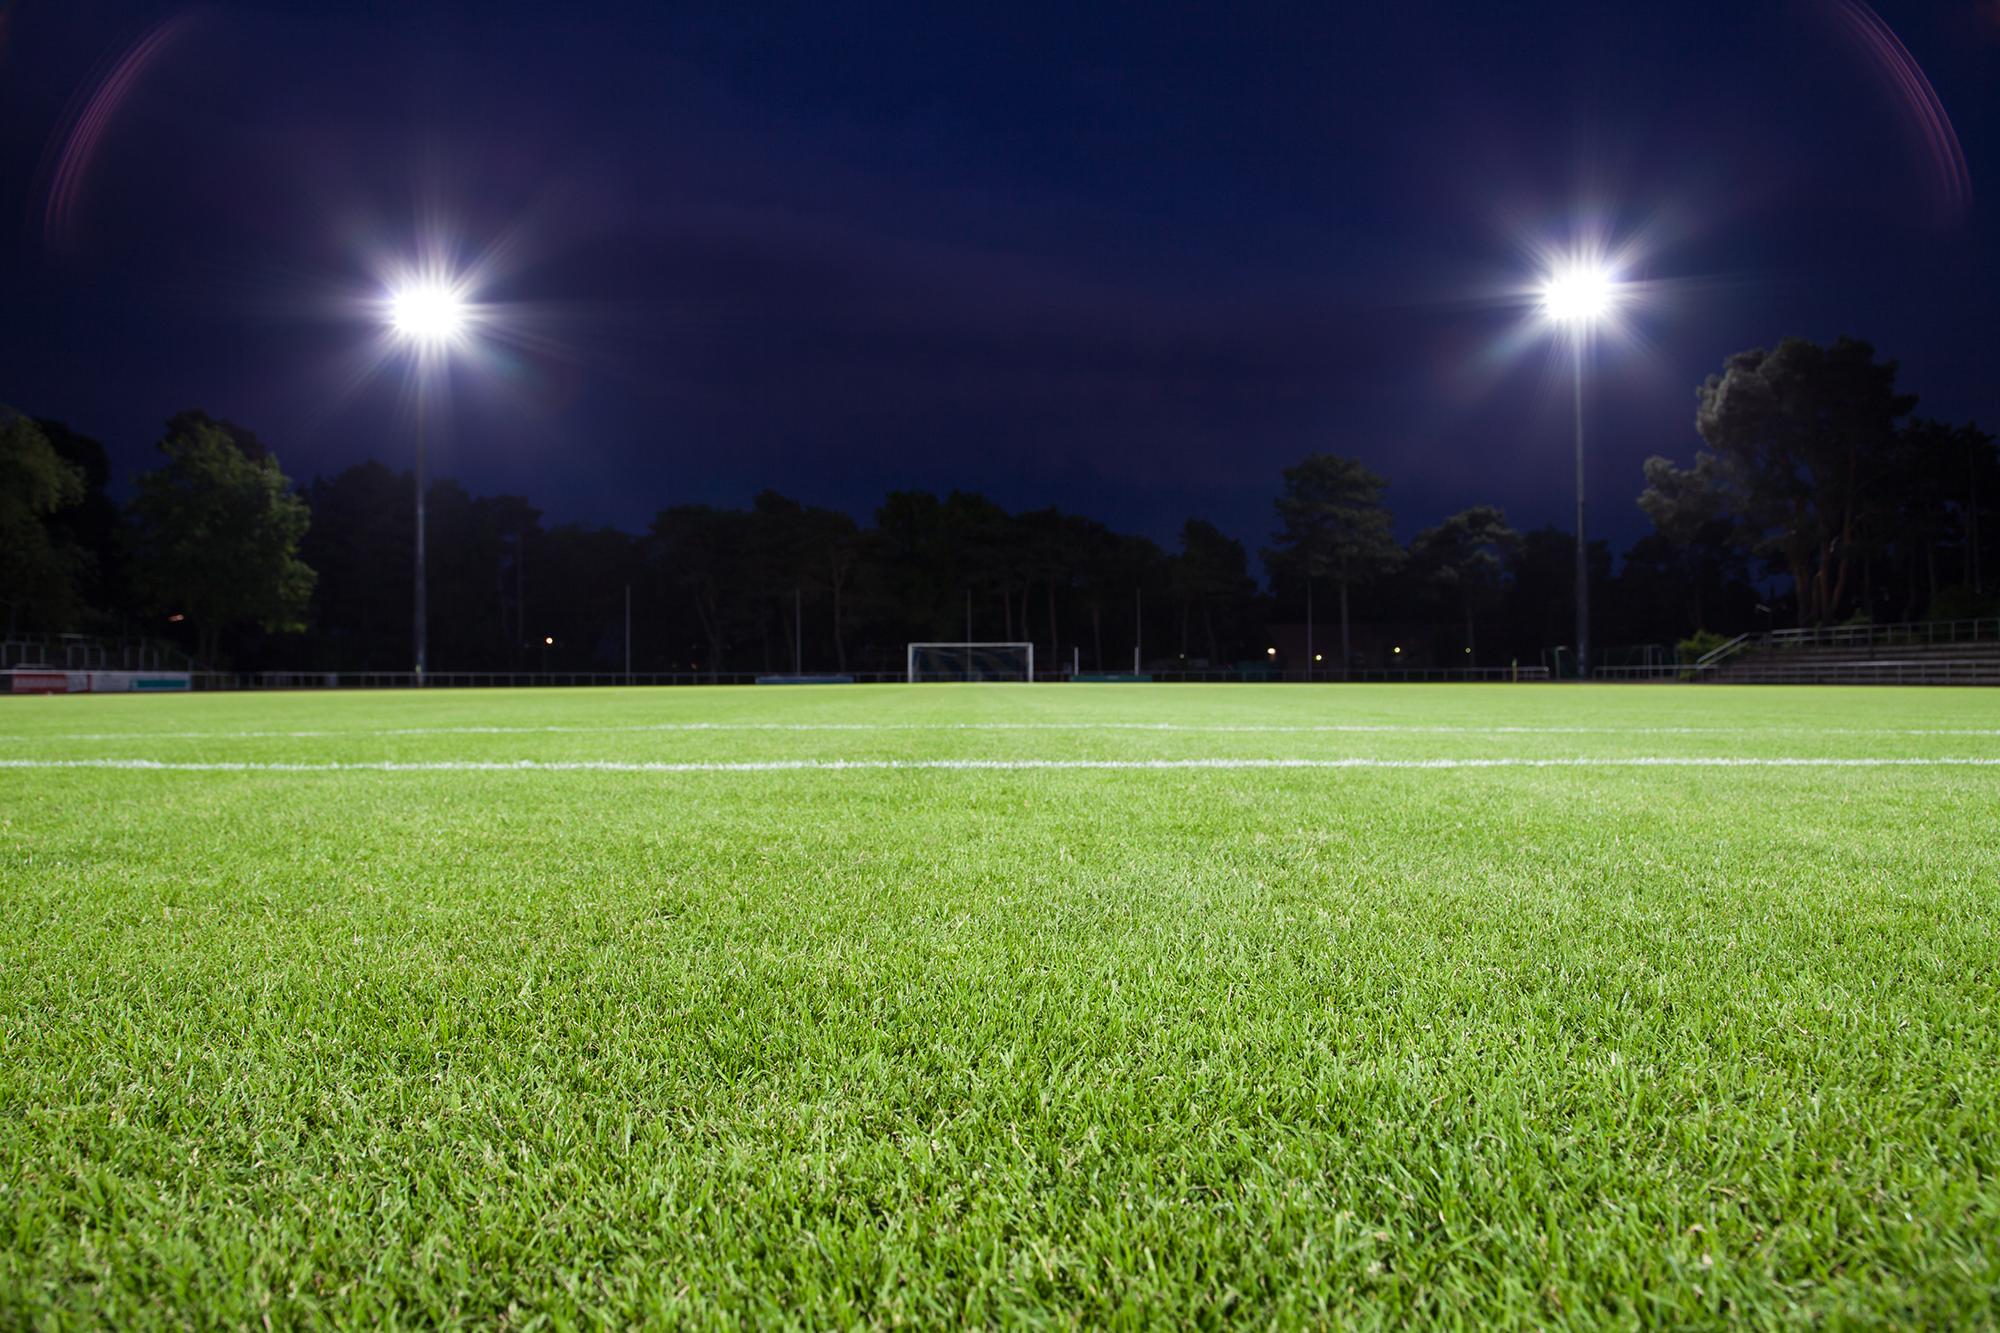 Led Voetbalveldverlichting Lichtscenario's voorprogrammeren